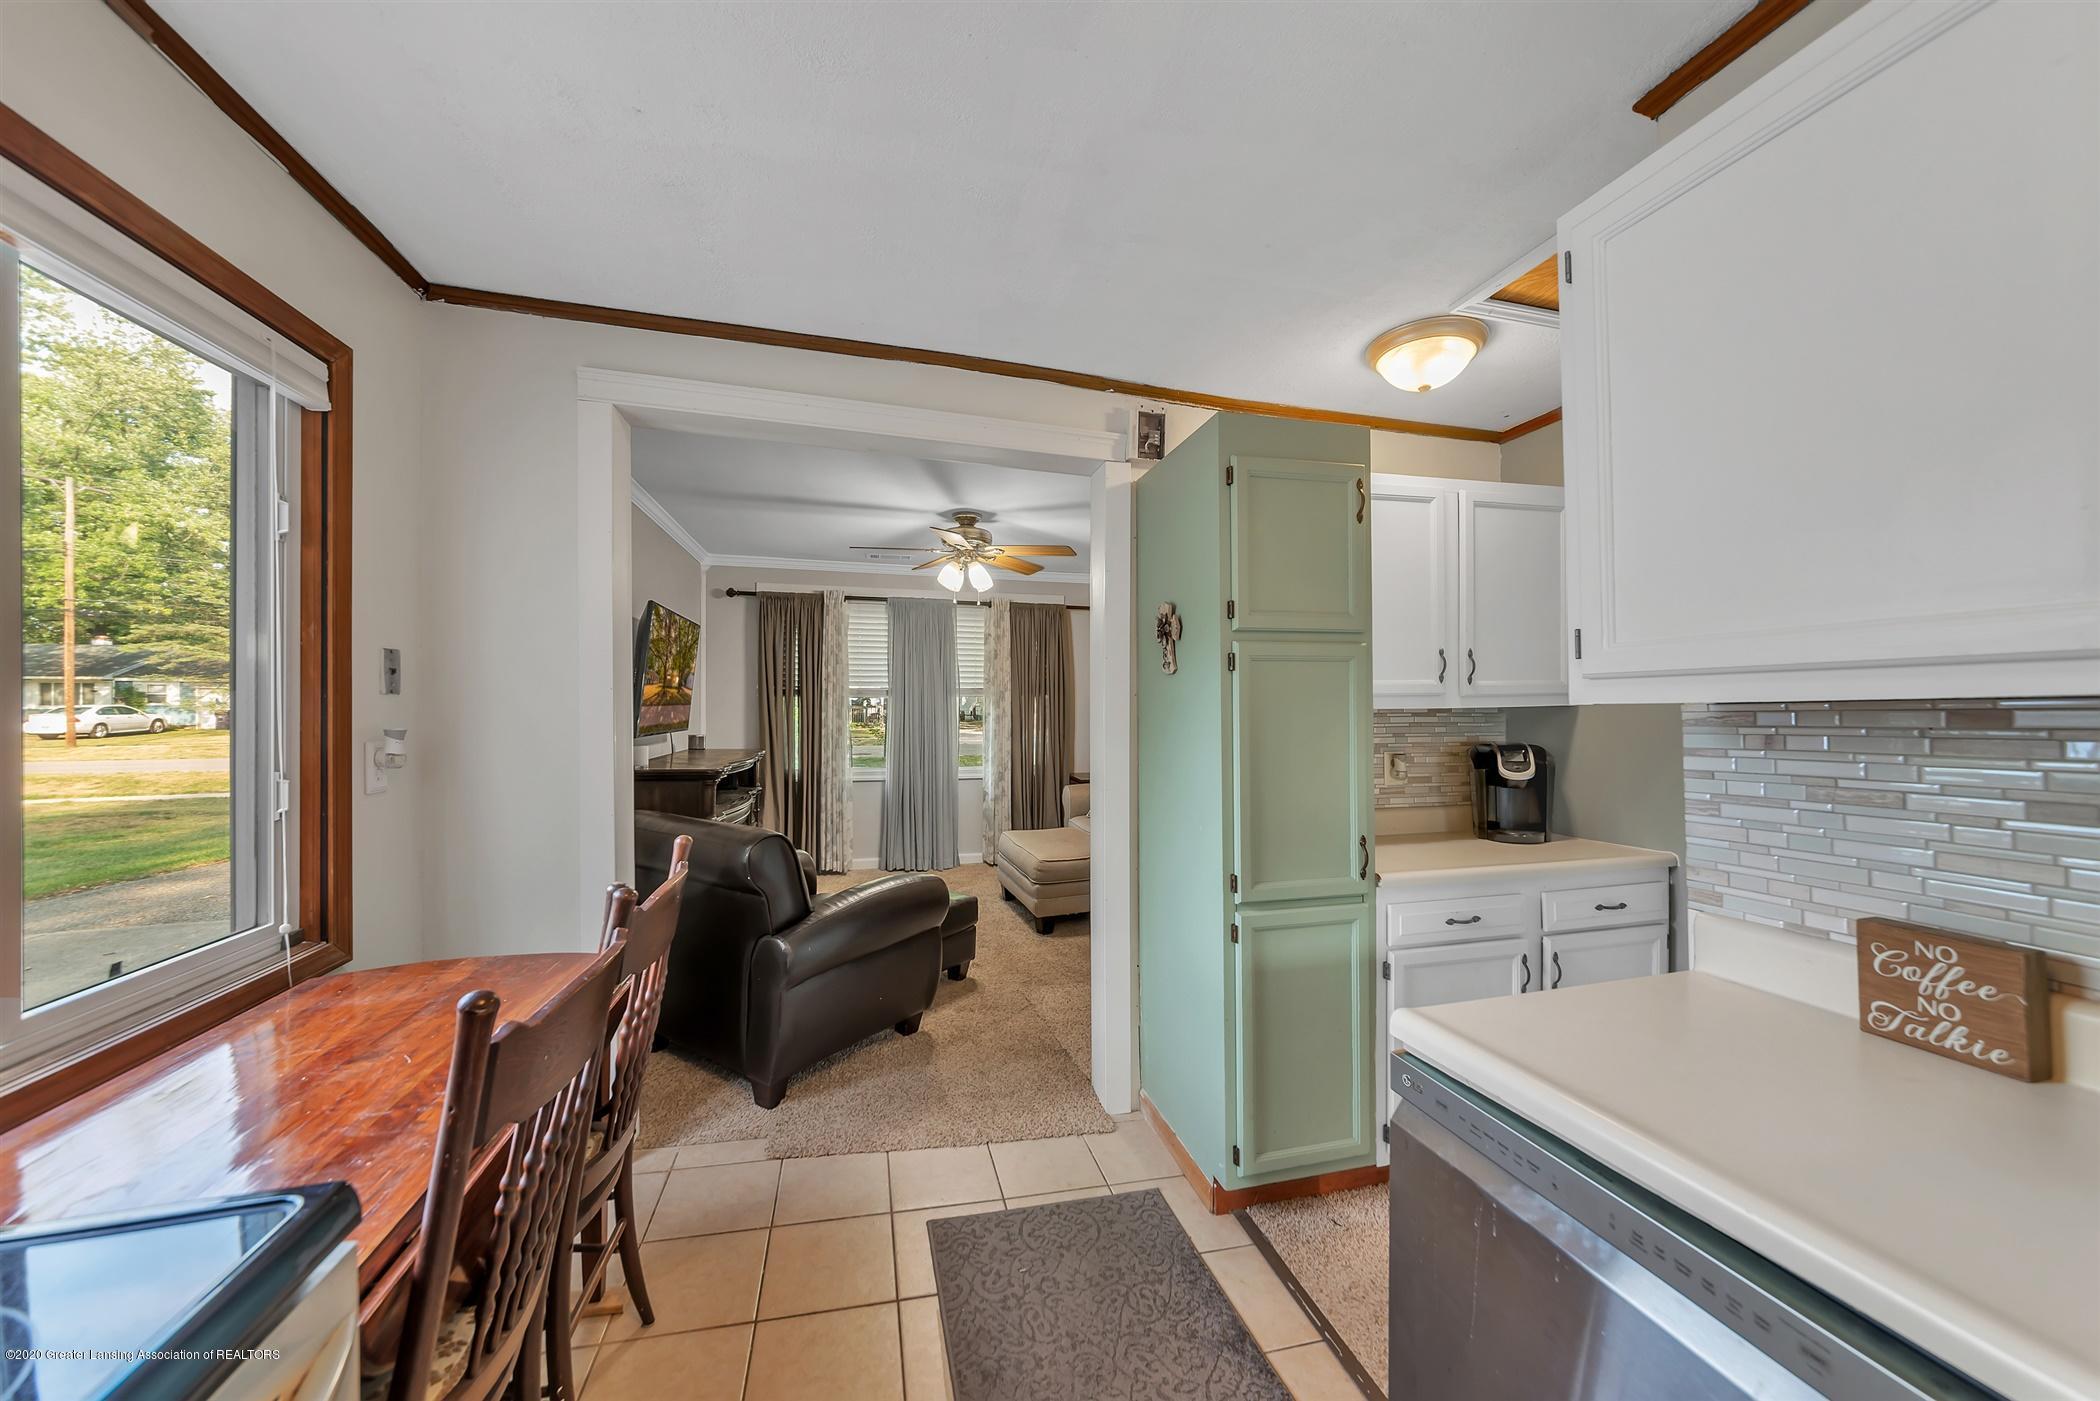 2029 Phillips Ave - 09-2029 Phillips Avenue-WindowStill - 9